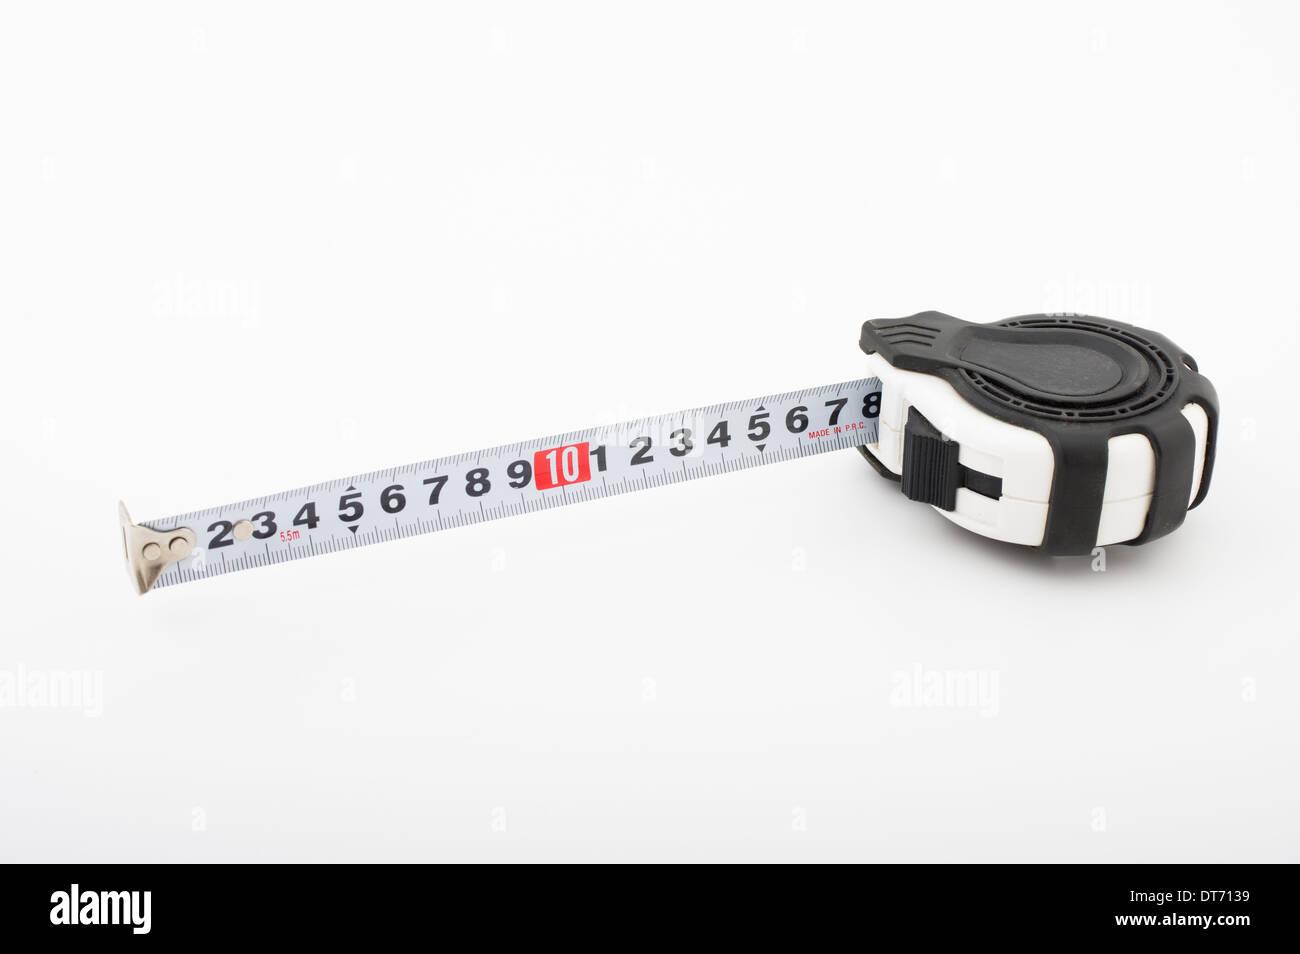 Rollup-Maßband (metrisch) ein flexibles Lineal selbst zurückziehen Stockbild